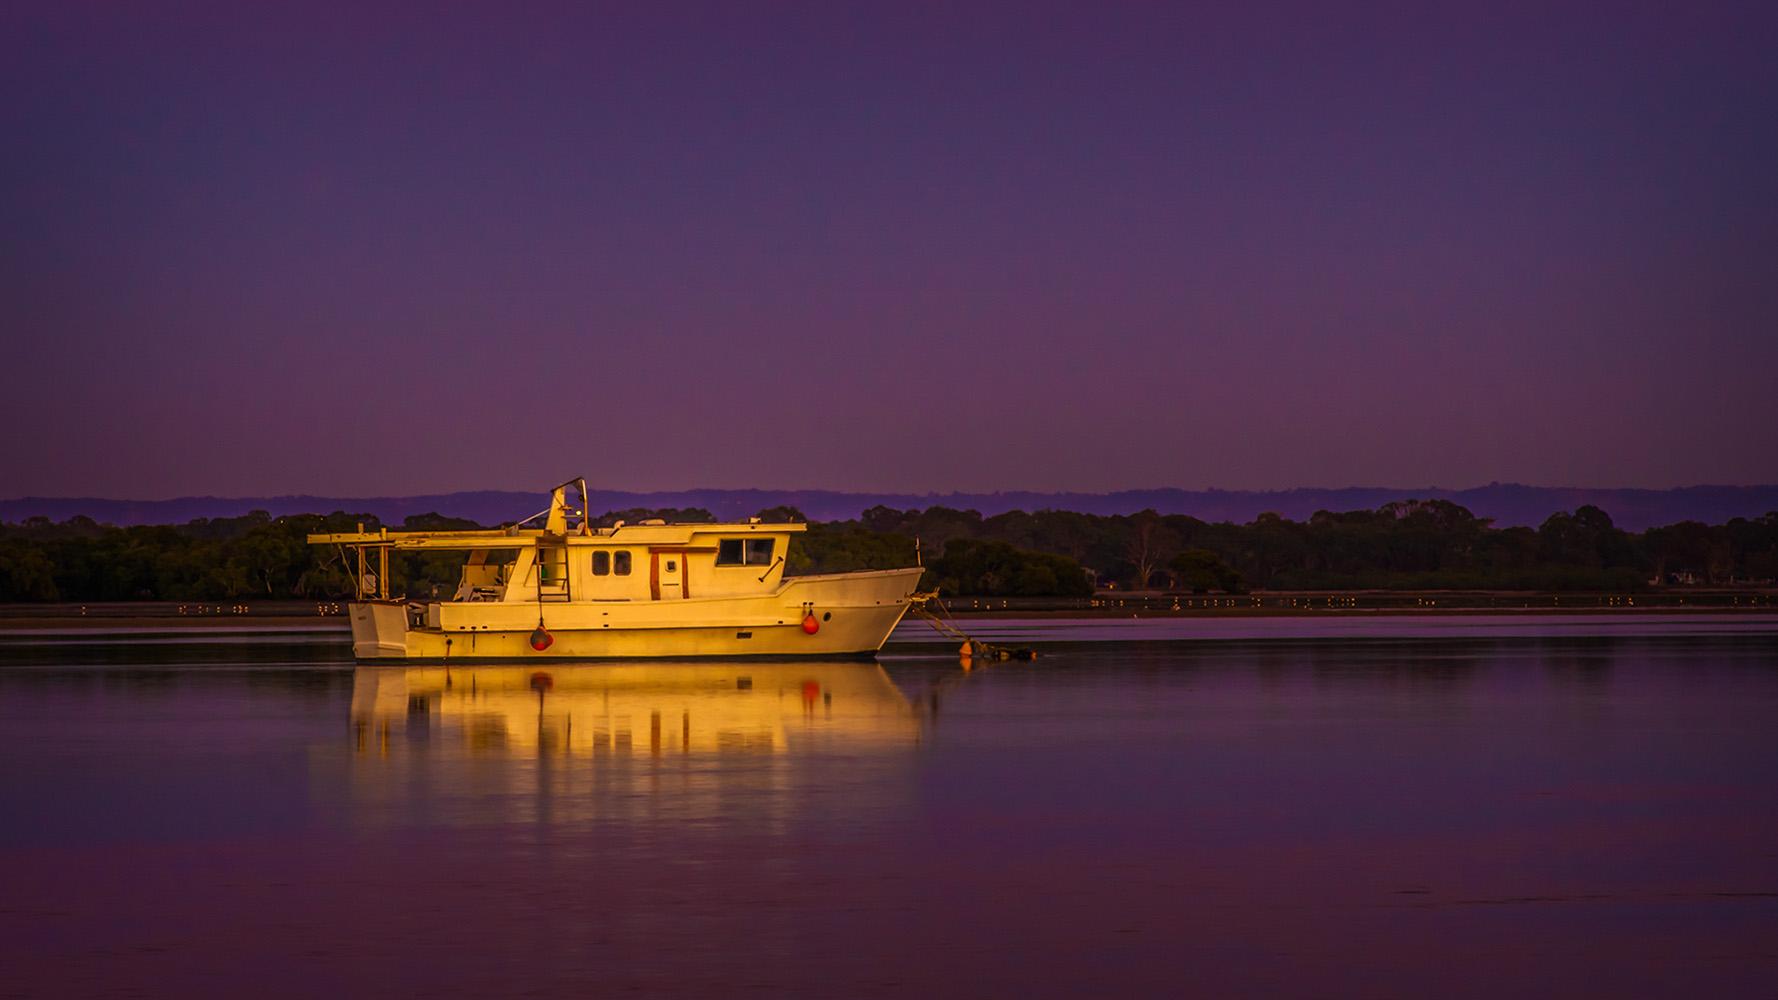 by Ben Stoffl, Gold Coast Retro Photographers Group